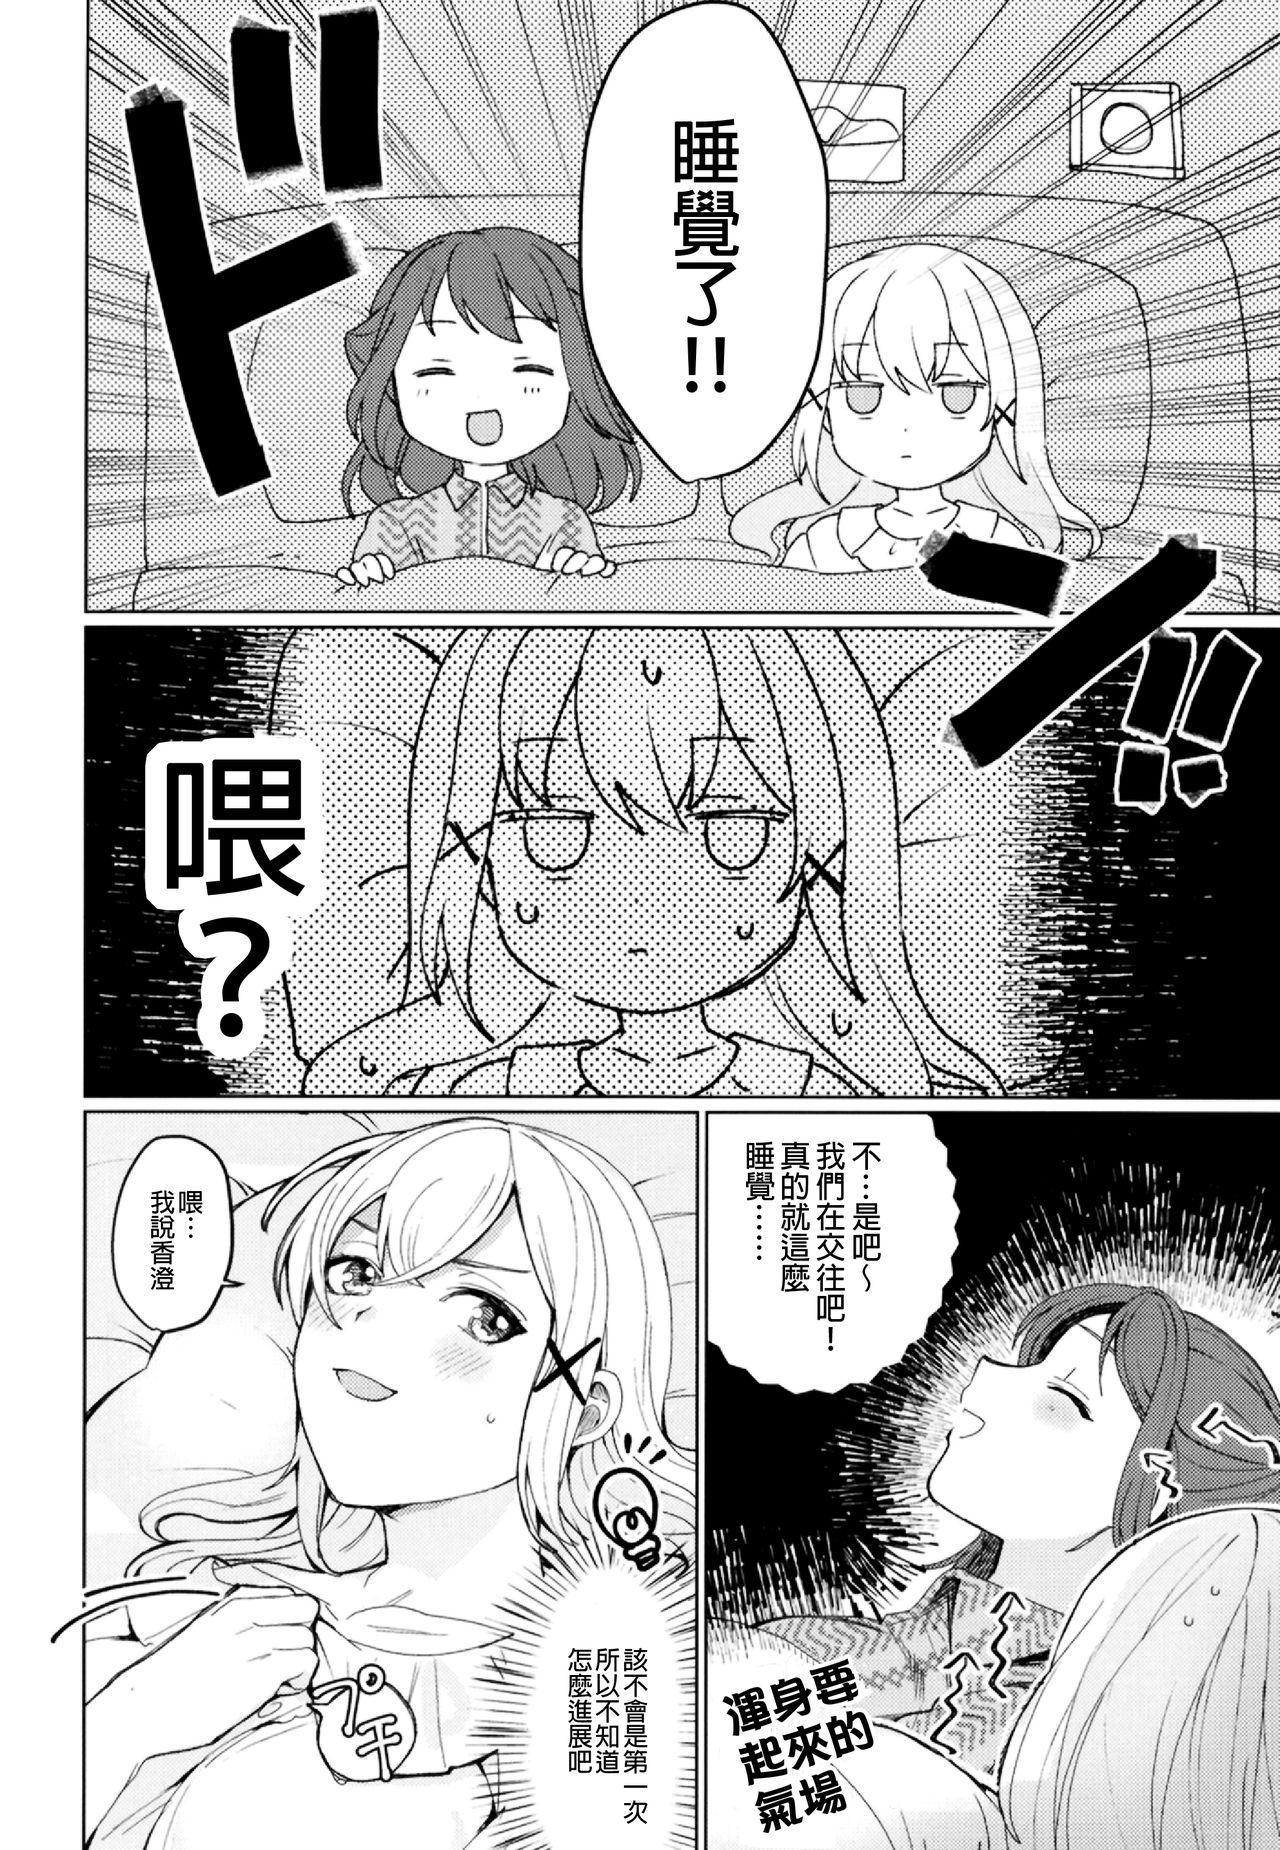 Kimi to Kirakira | 與妳閃閃發光 6